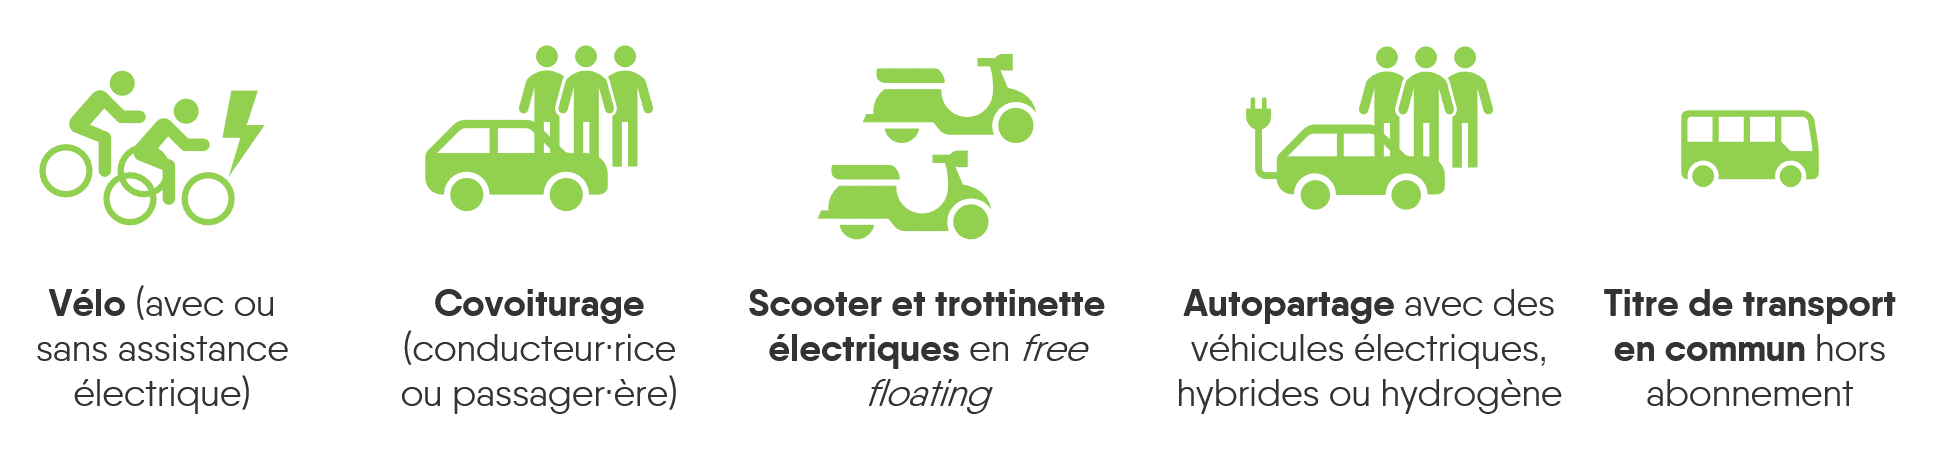 Moyens alternatifs mobilité durable